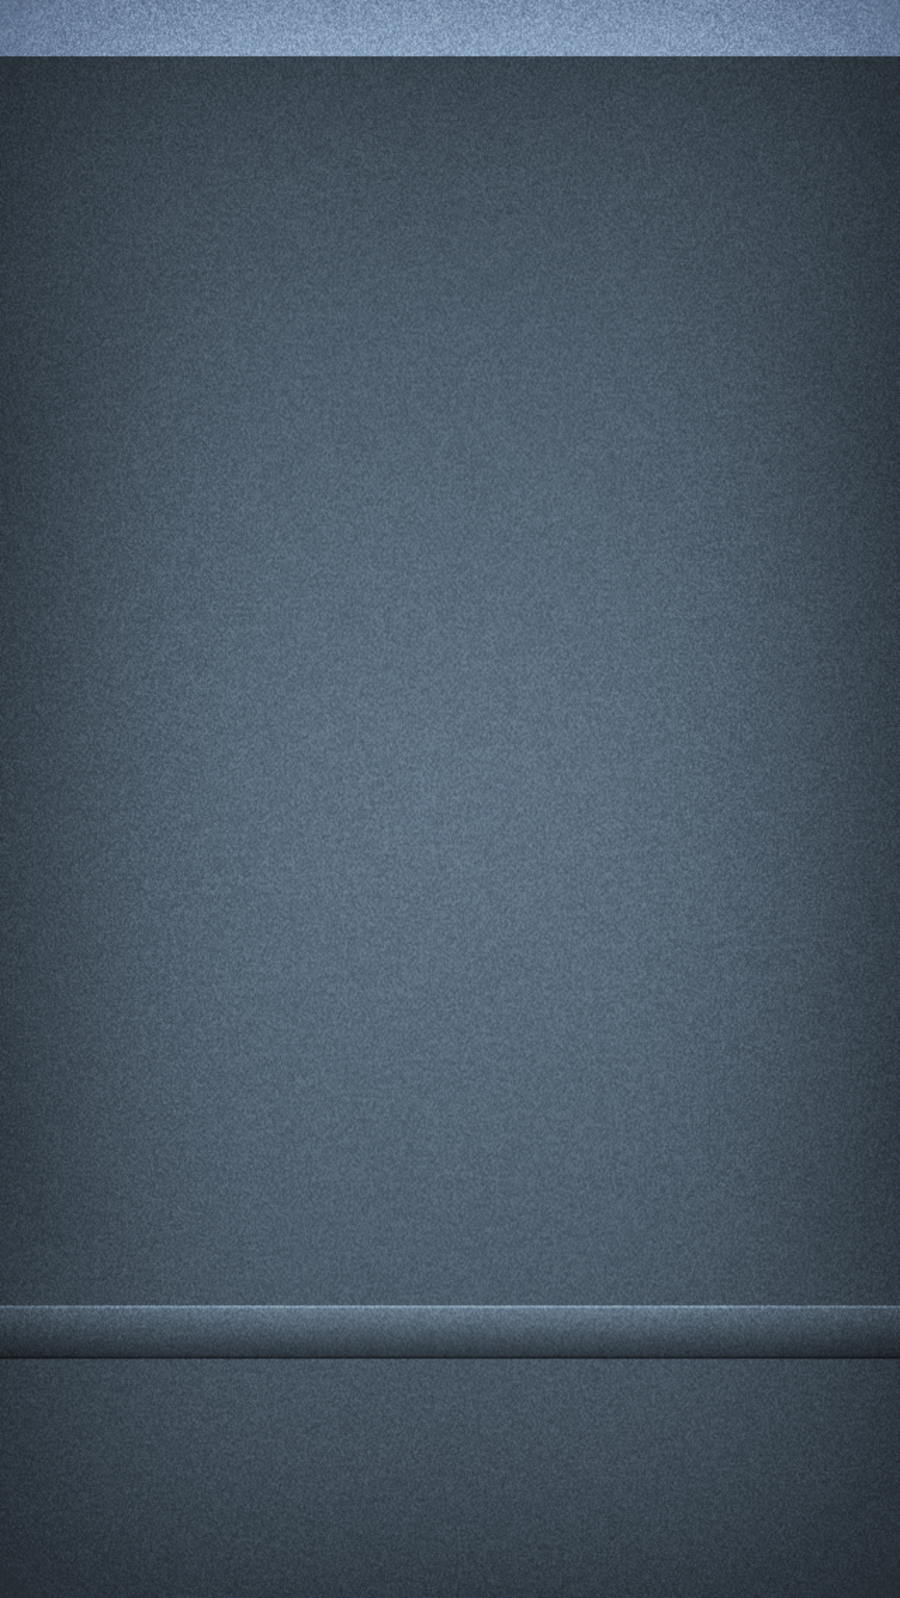 noise01 iphone 5 wallpaper by birnimal customization wallpaper iphone 900x1598